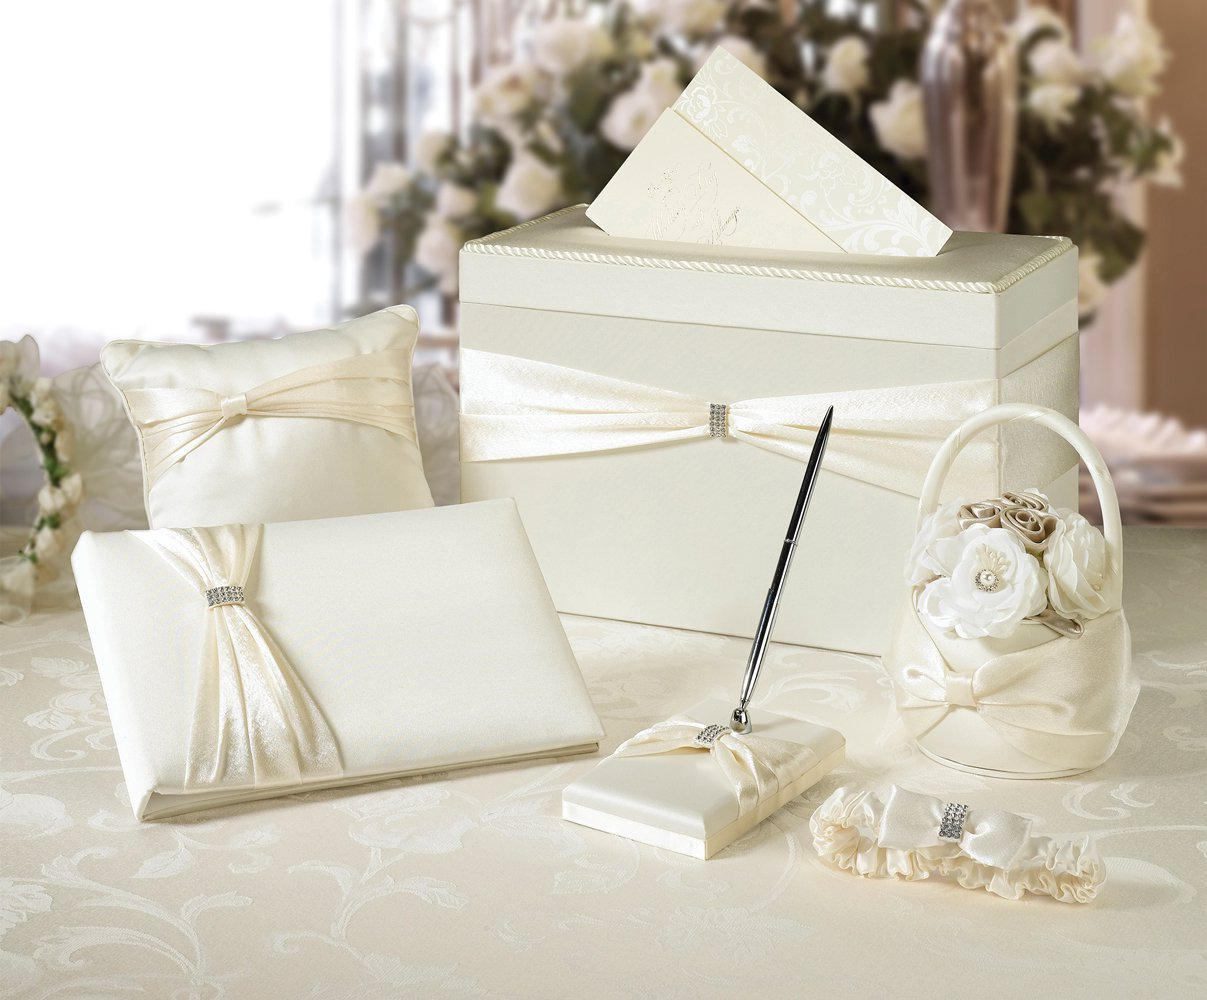 Wedding In A Box - 6 Piece Ivory Accessory Set